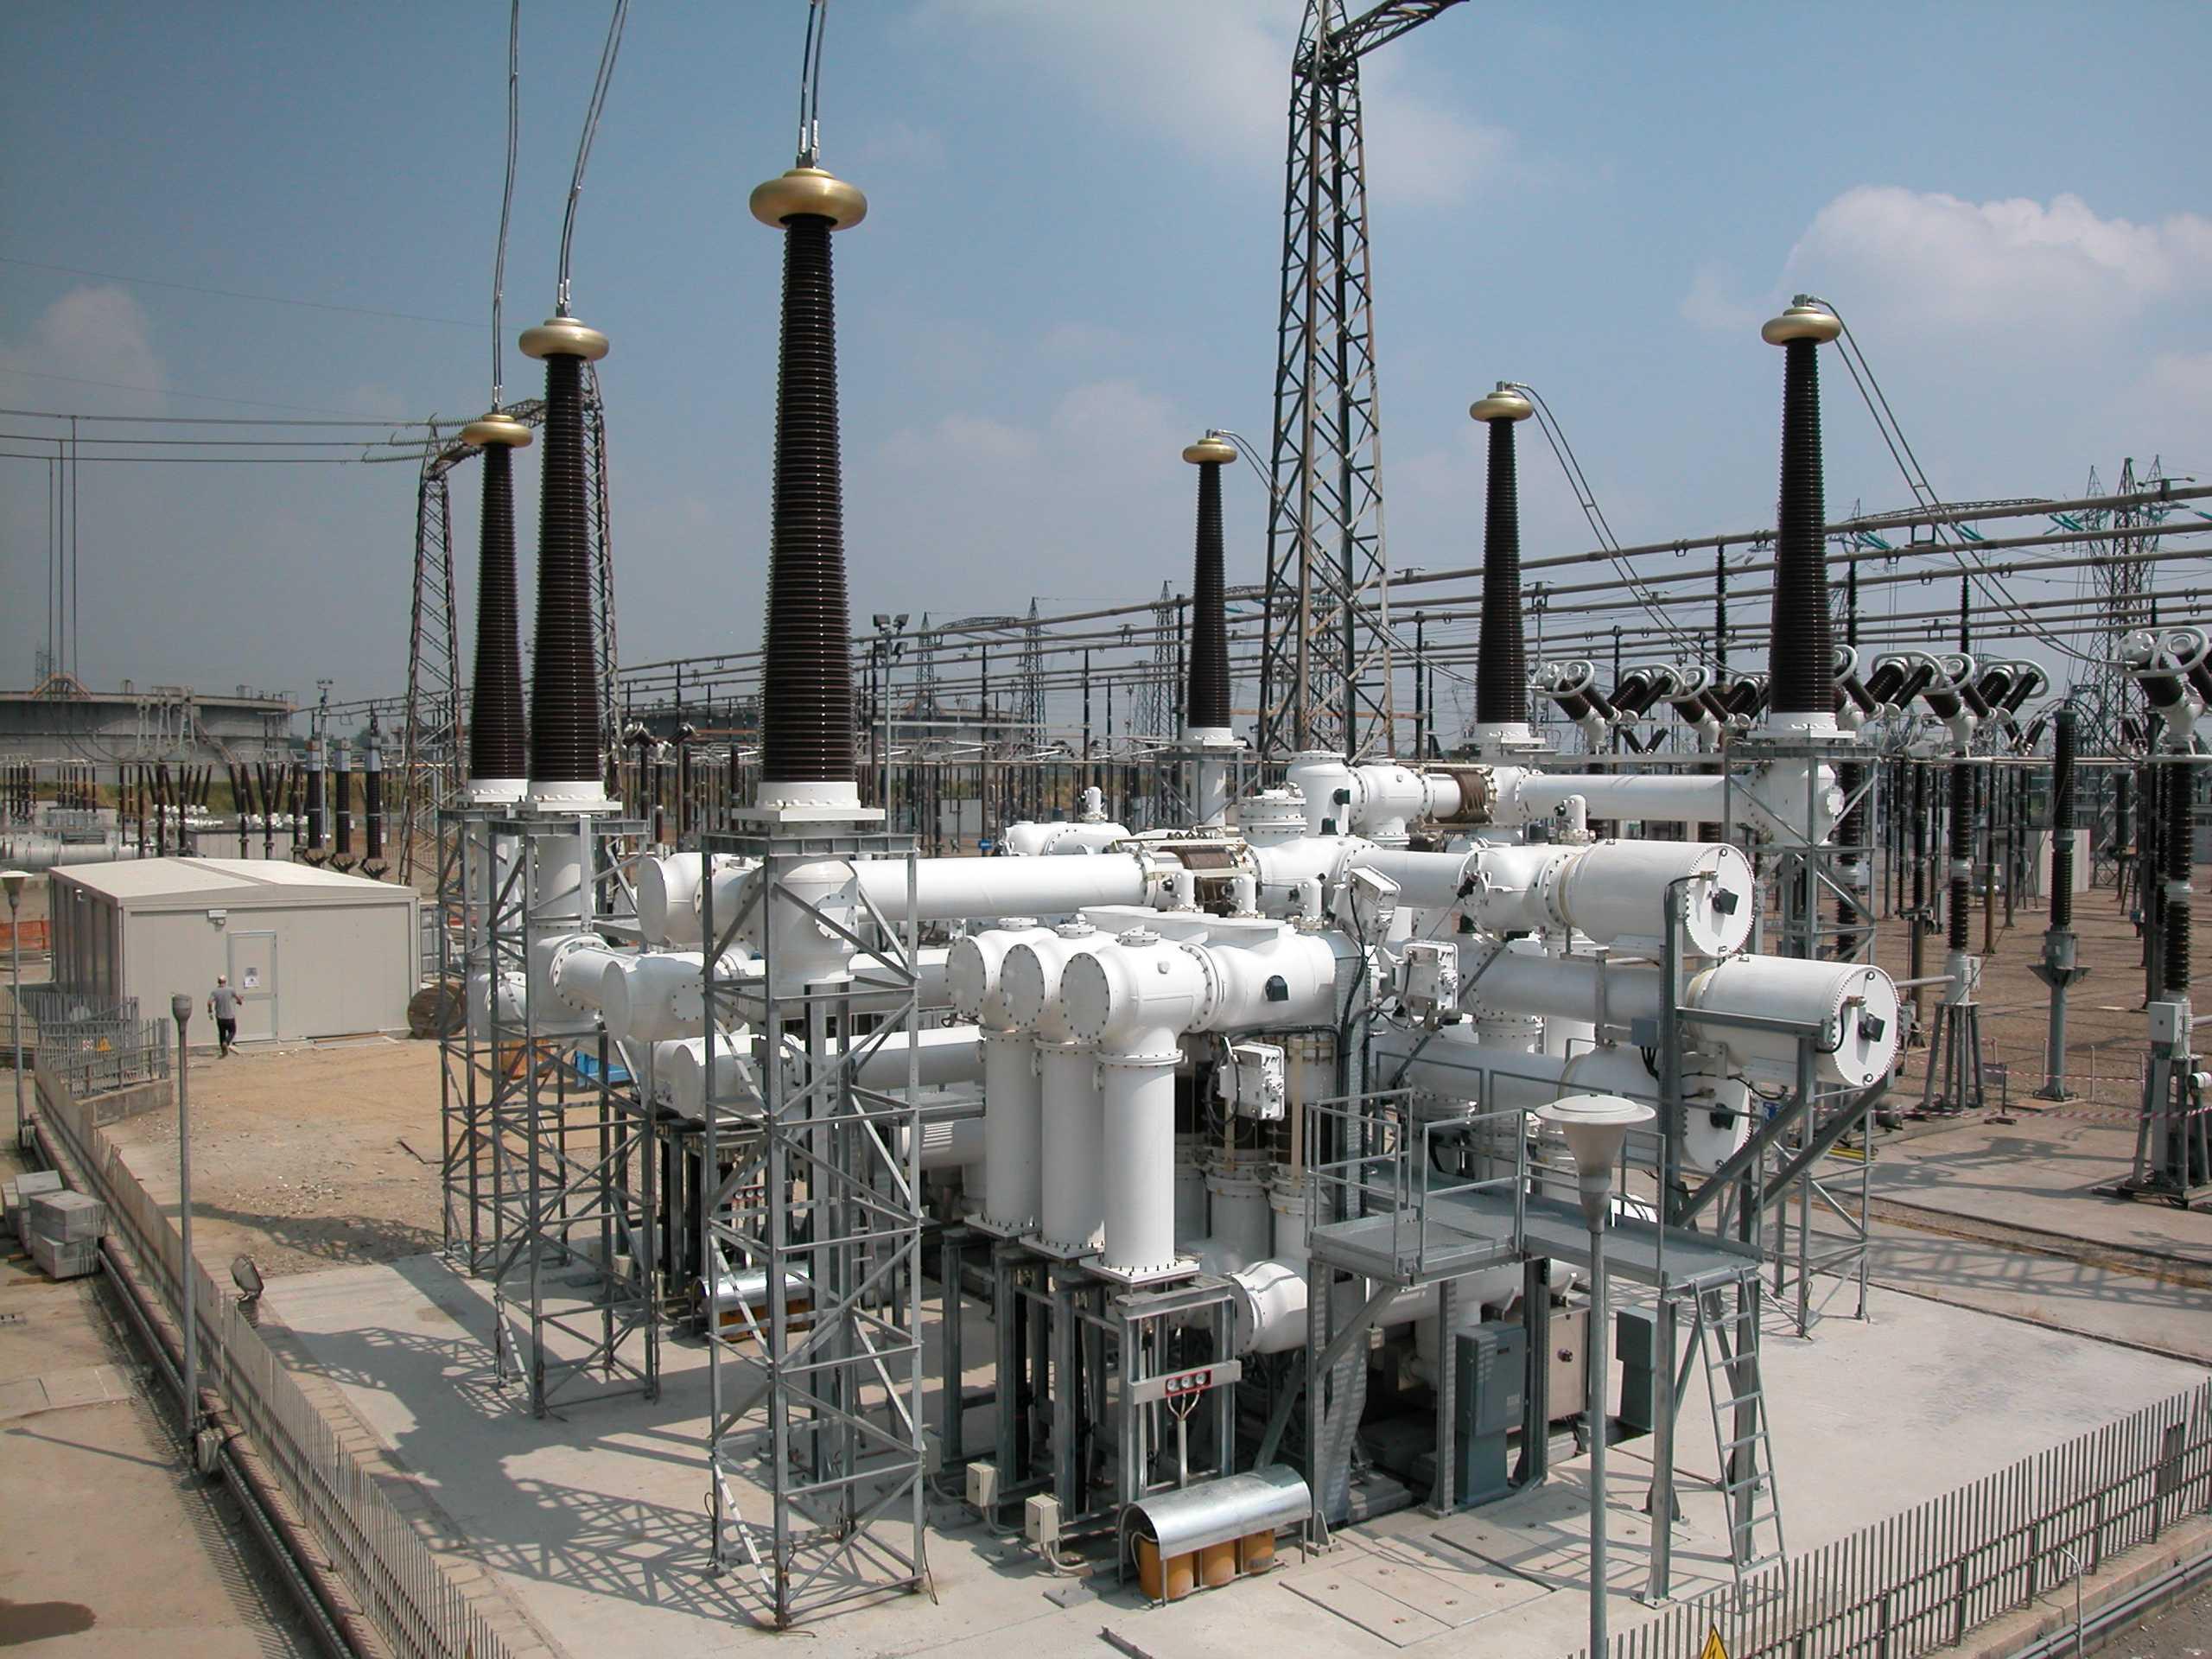 Sulfur hexafluoride gas circuit breakers in a 420 kv switchyard sulfur hexafluoride gas circuit breakers in a 420 kv switchyard 2560 1920 sciox Images